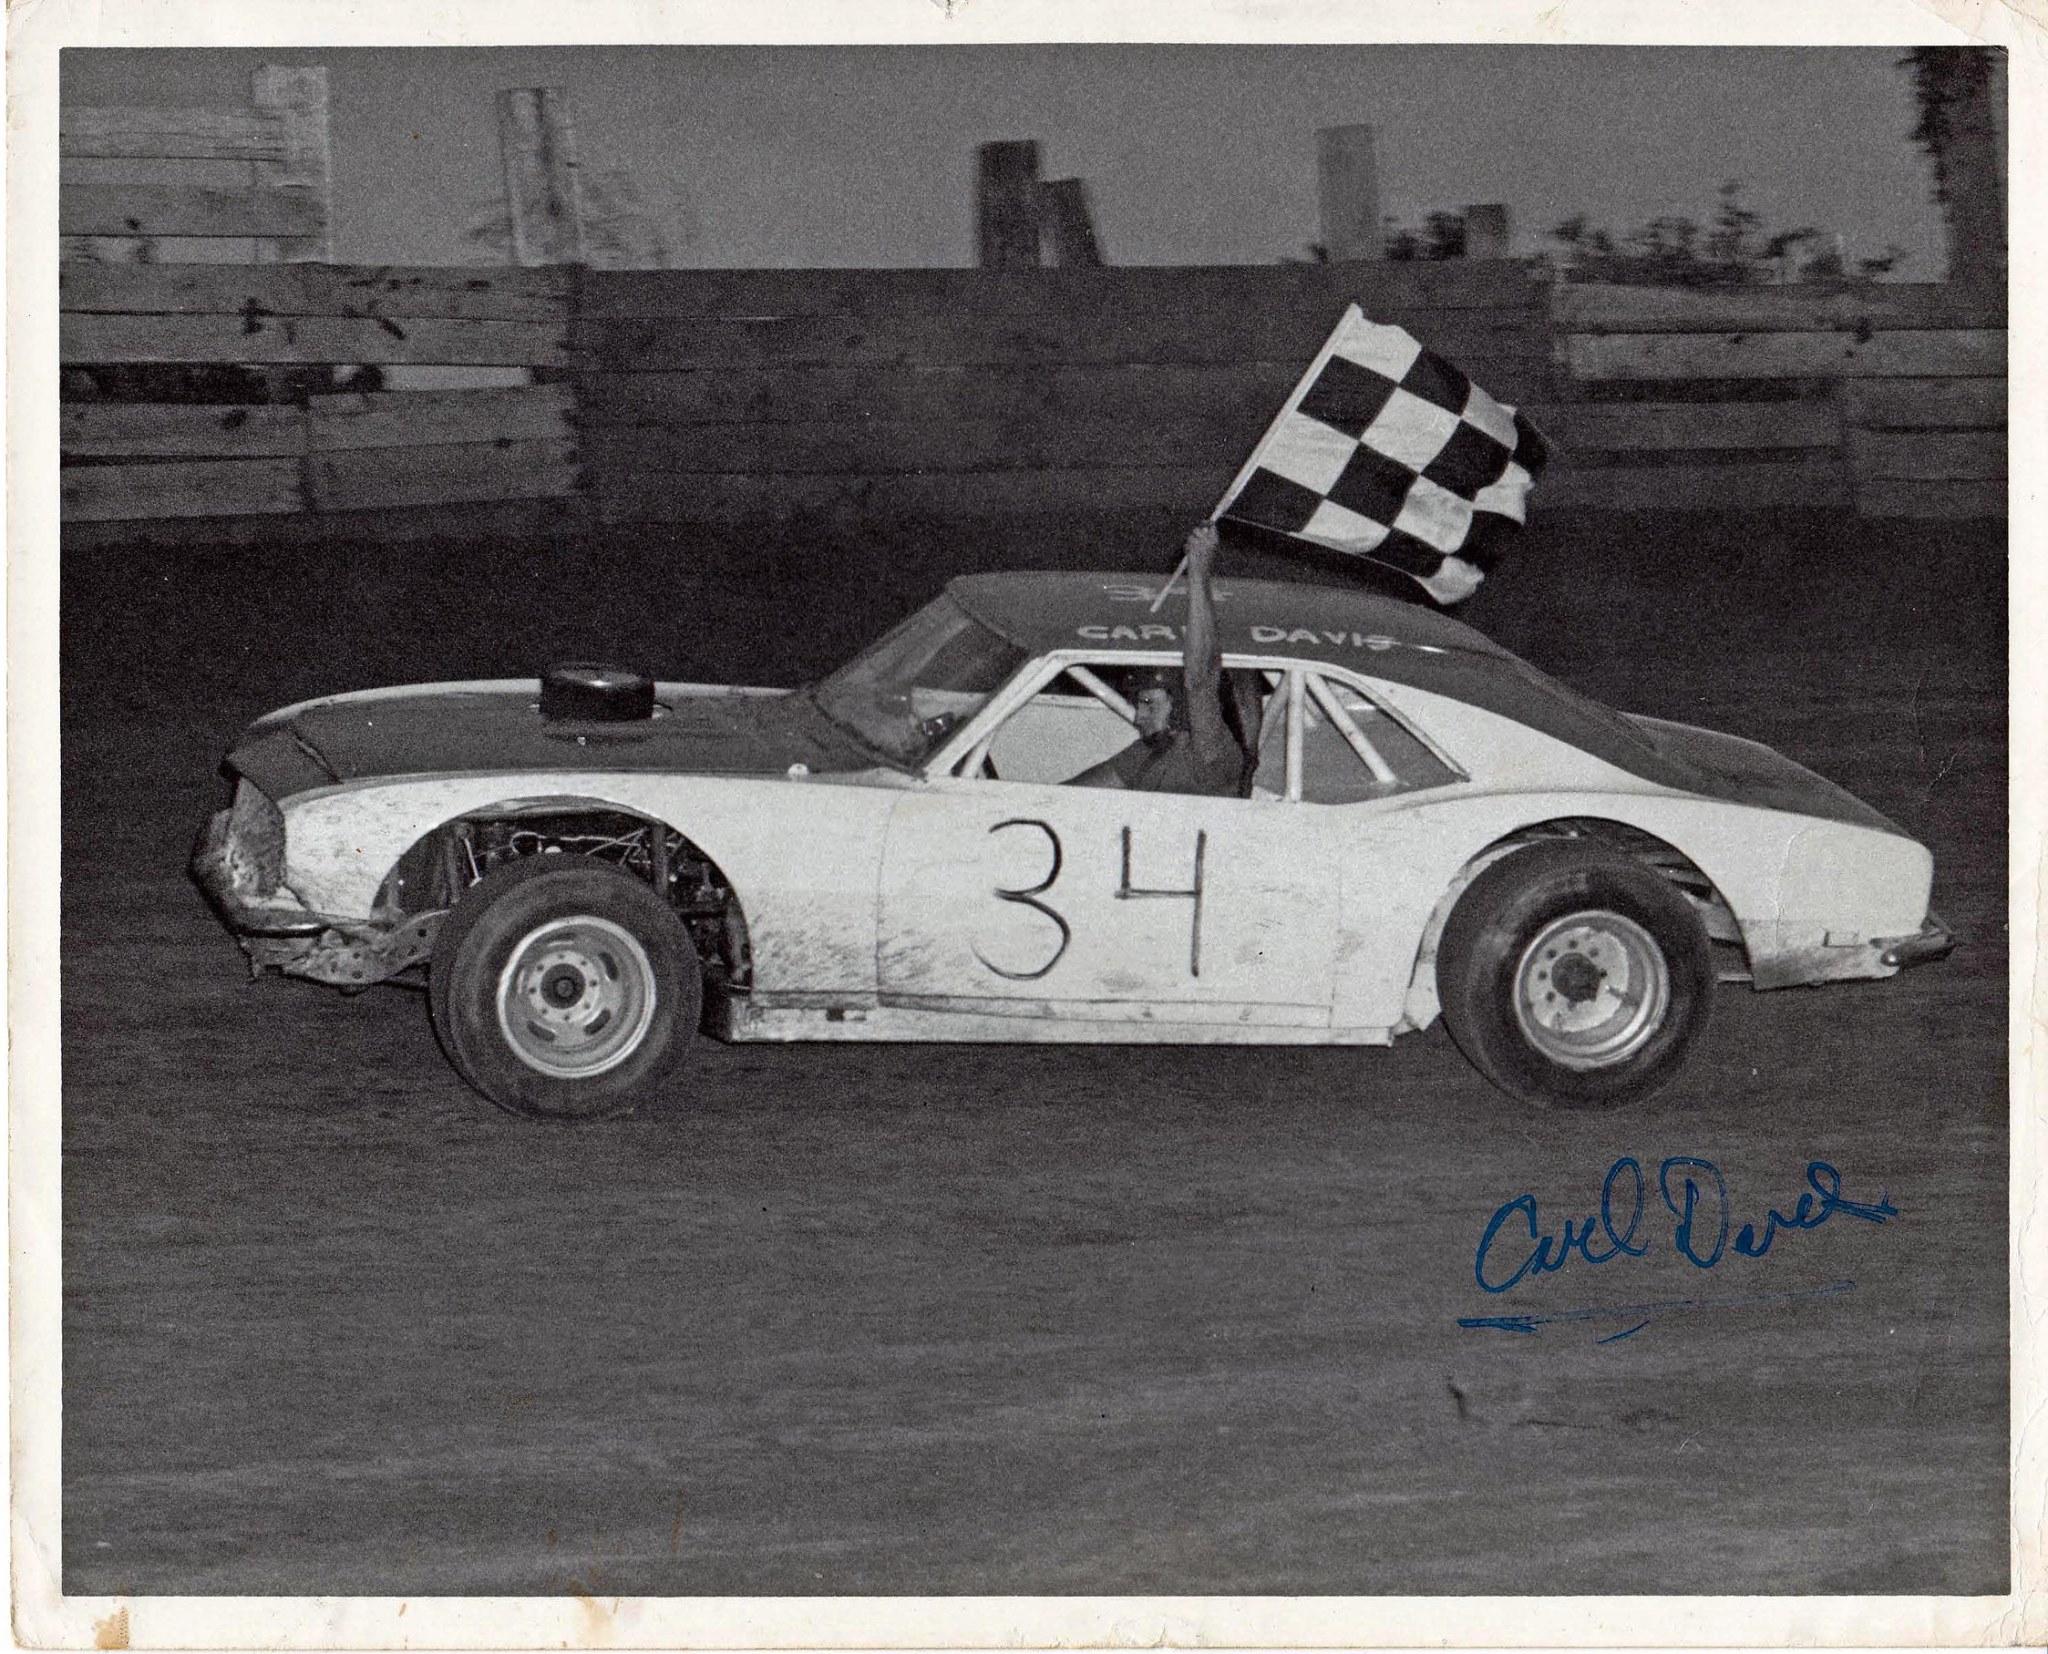 #34 Carl Davis